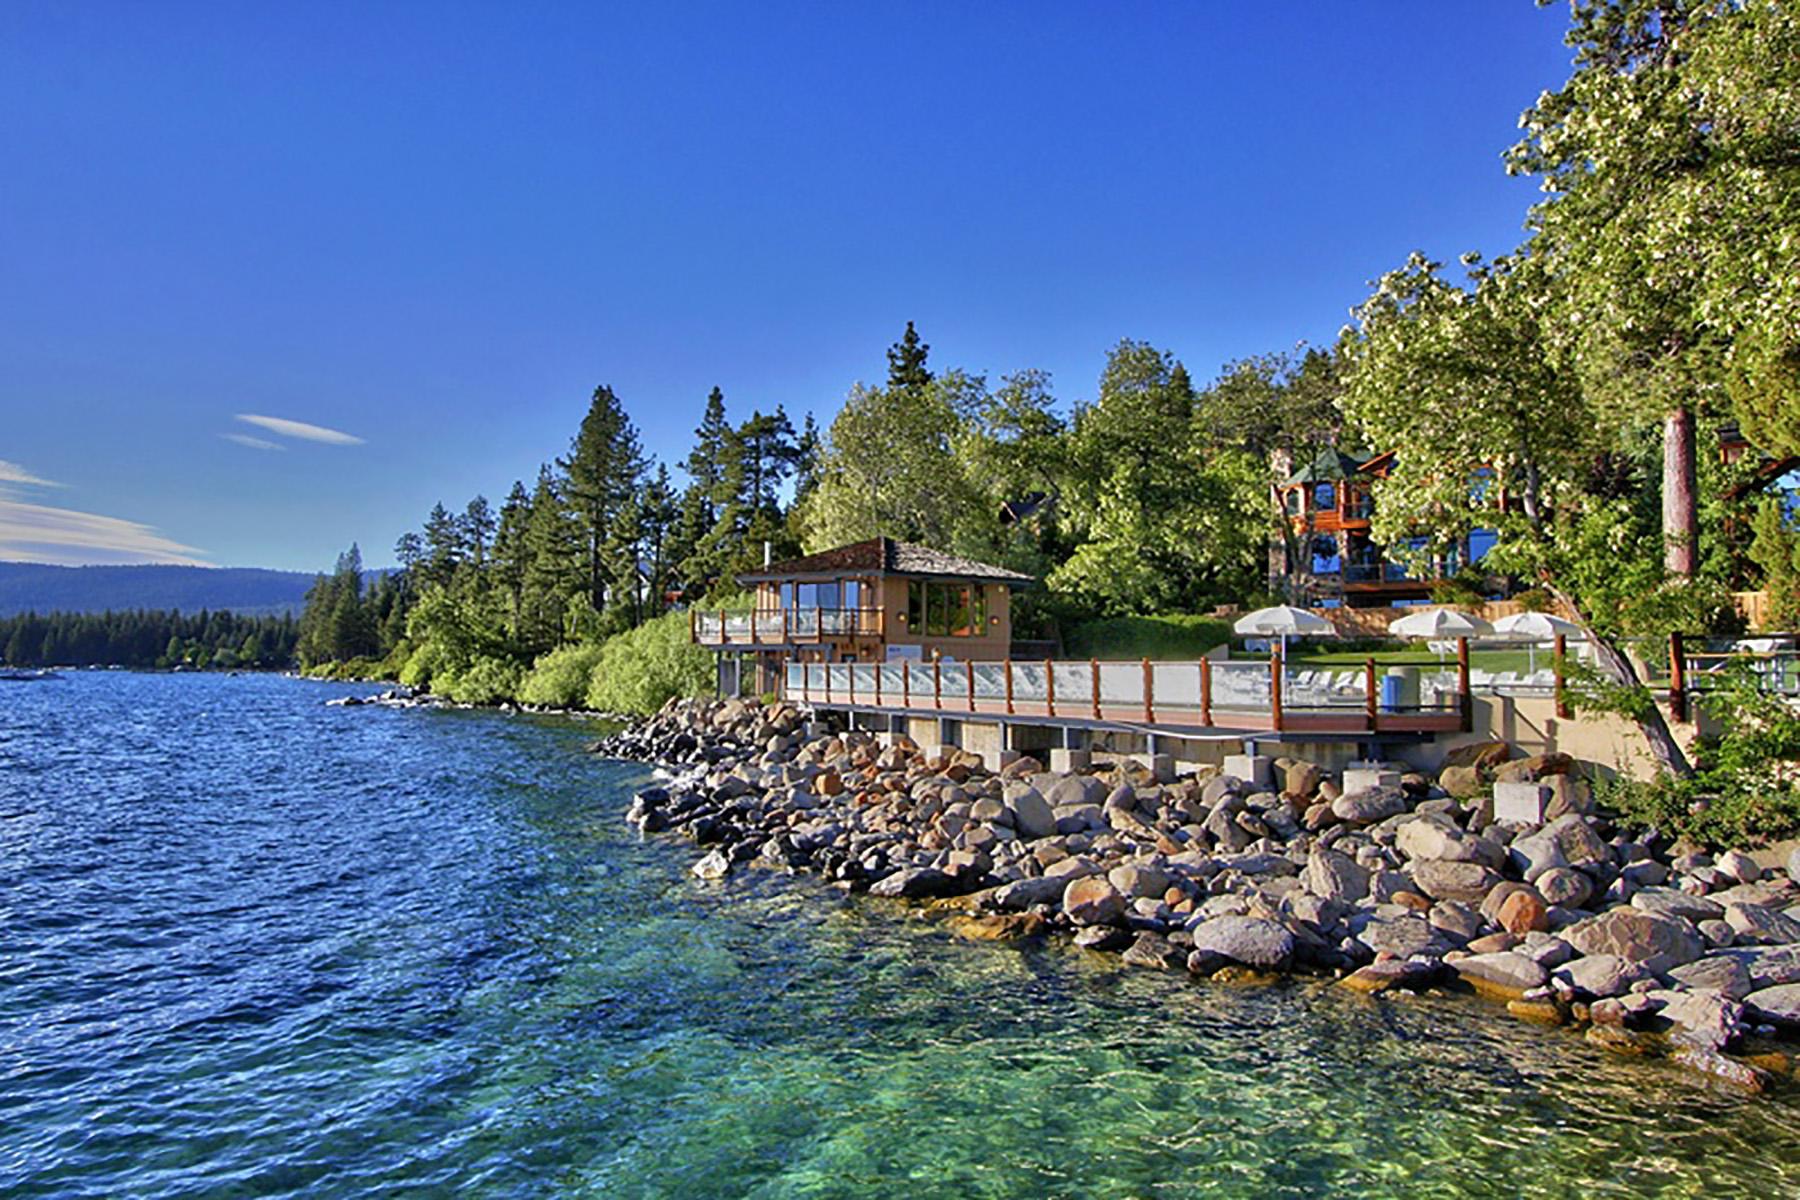 Additional photo for property listing at 9200 Brockway Springs Drive #61, Kings Beach, CA 9200 Brockway Springs Drive #61 Kings Beach, California 96143 United States